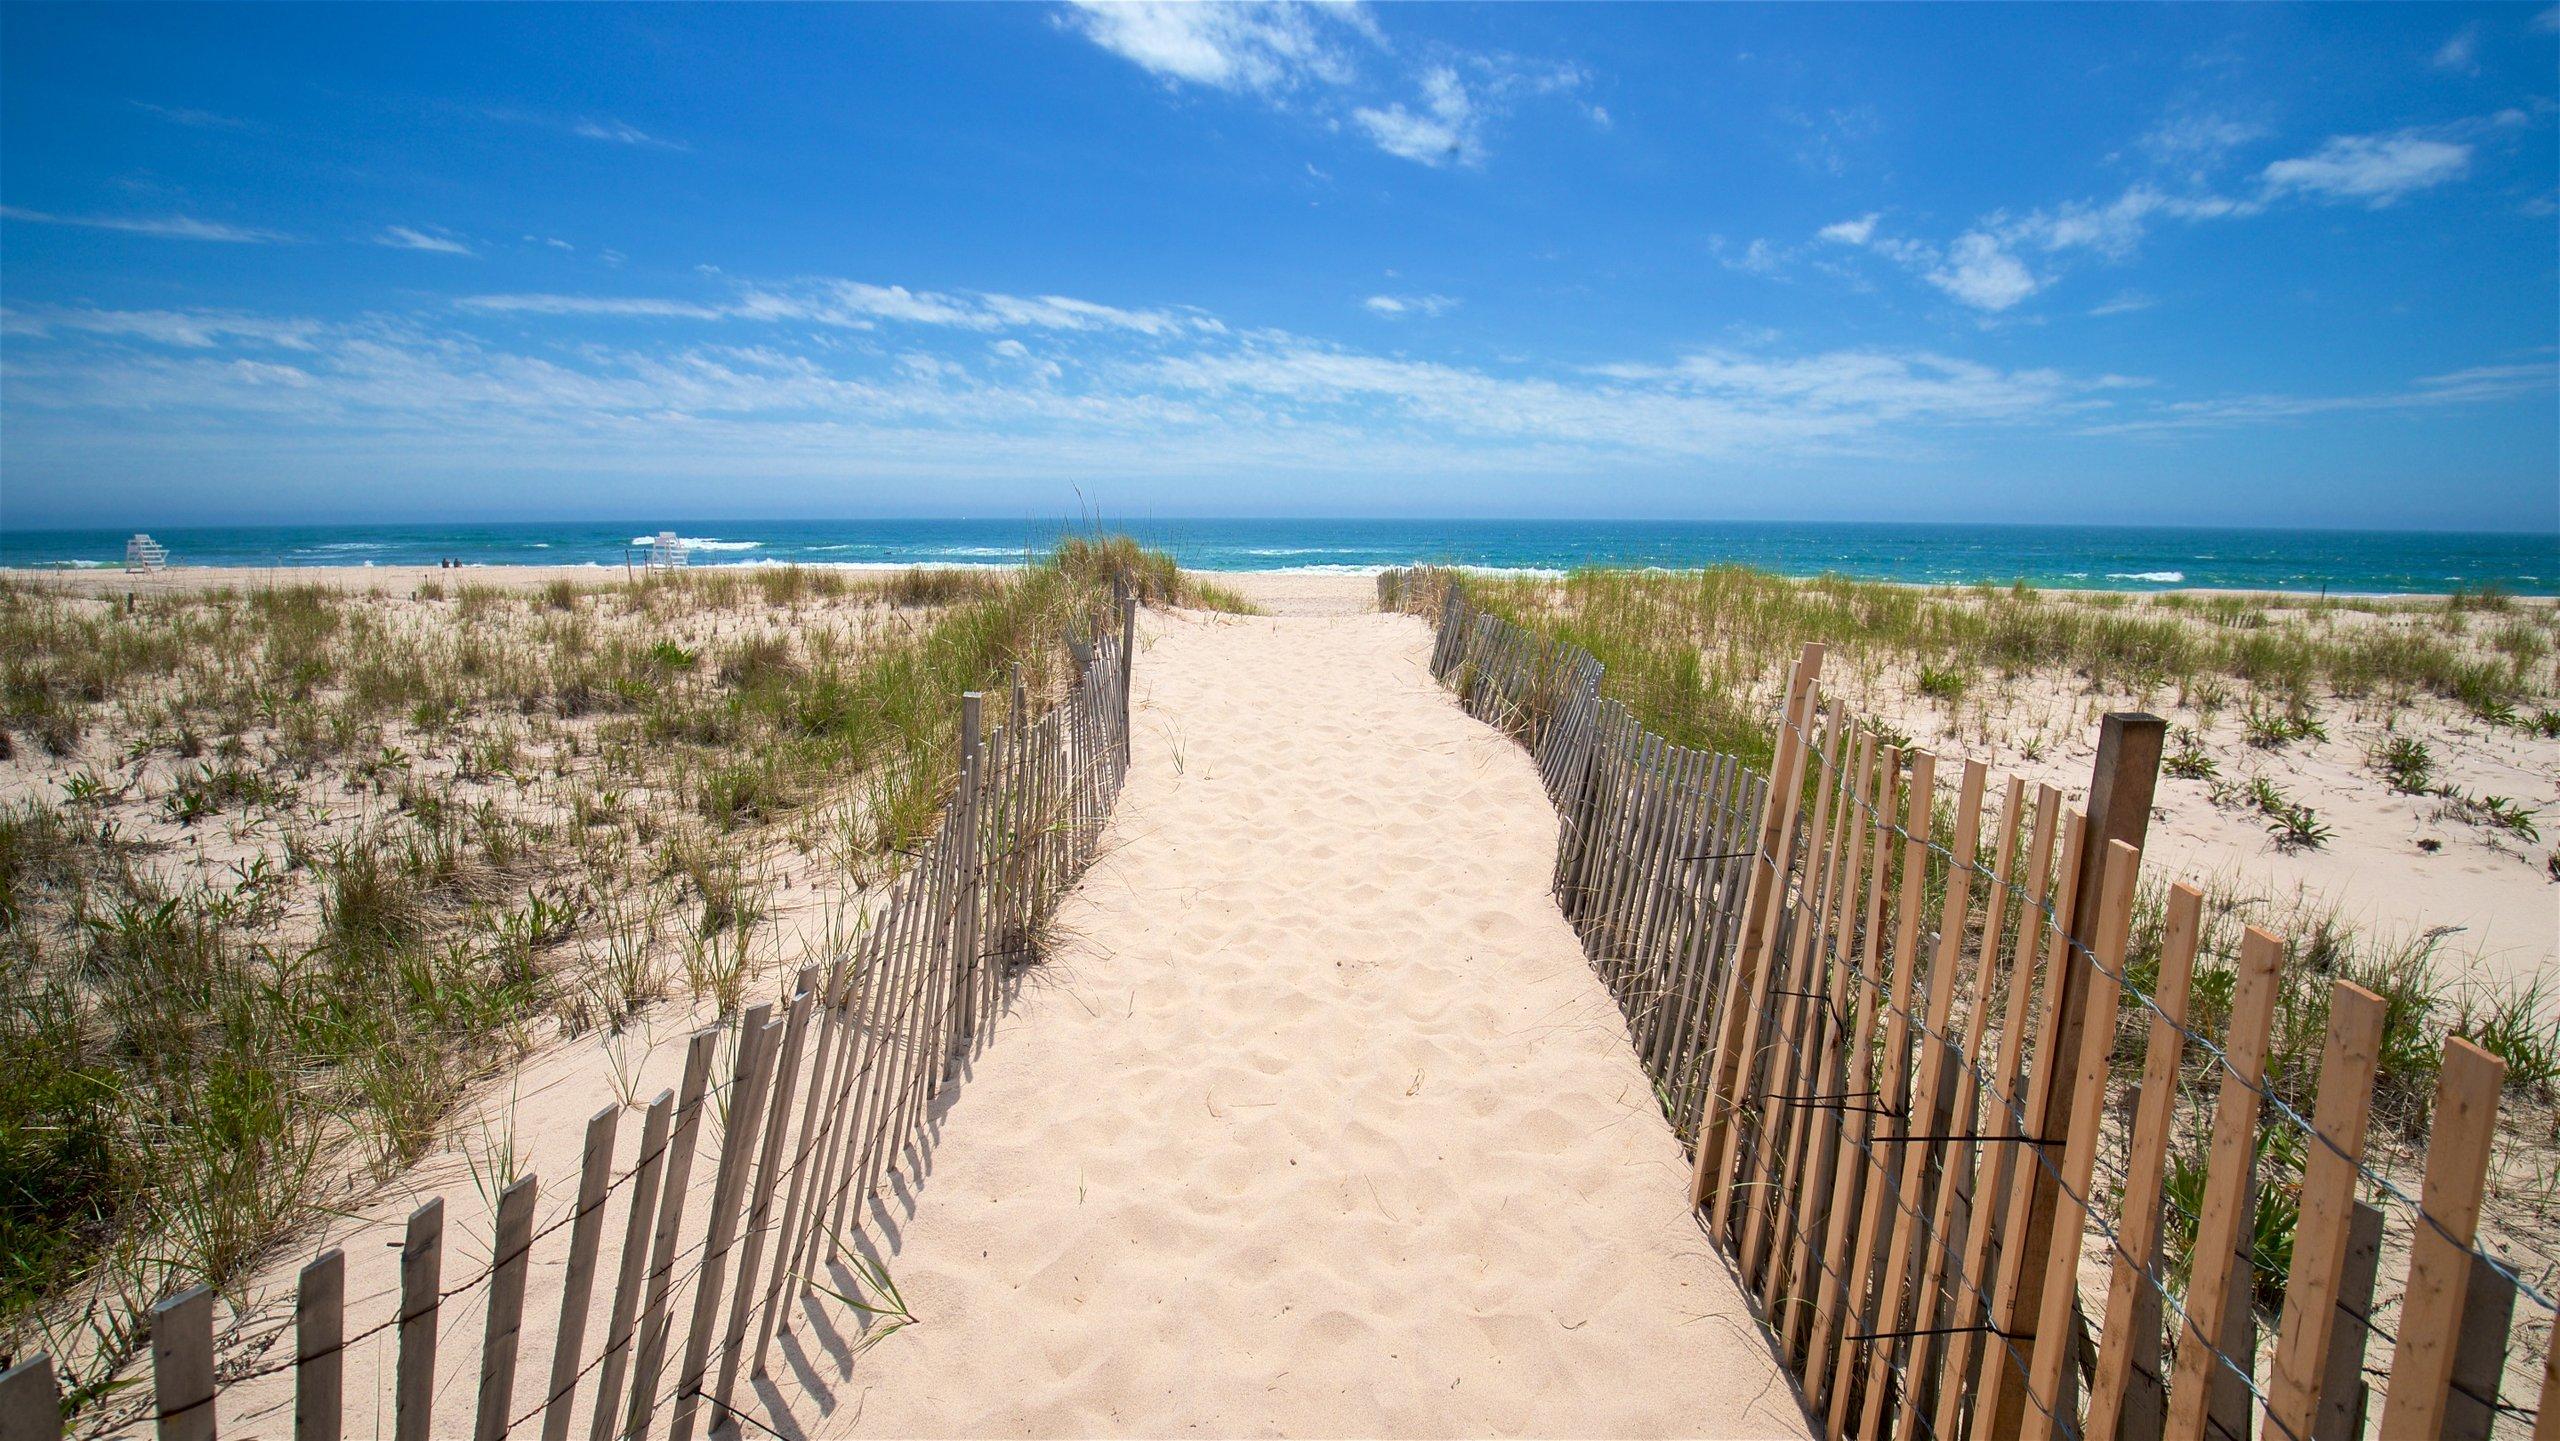 Hampton Bays, New York, United States of America